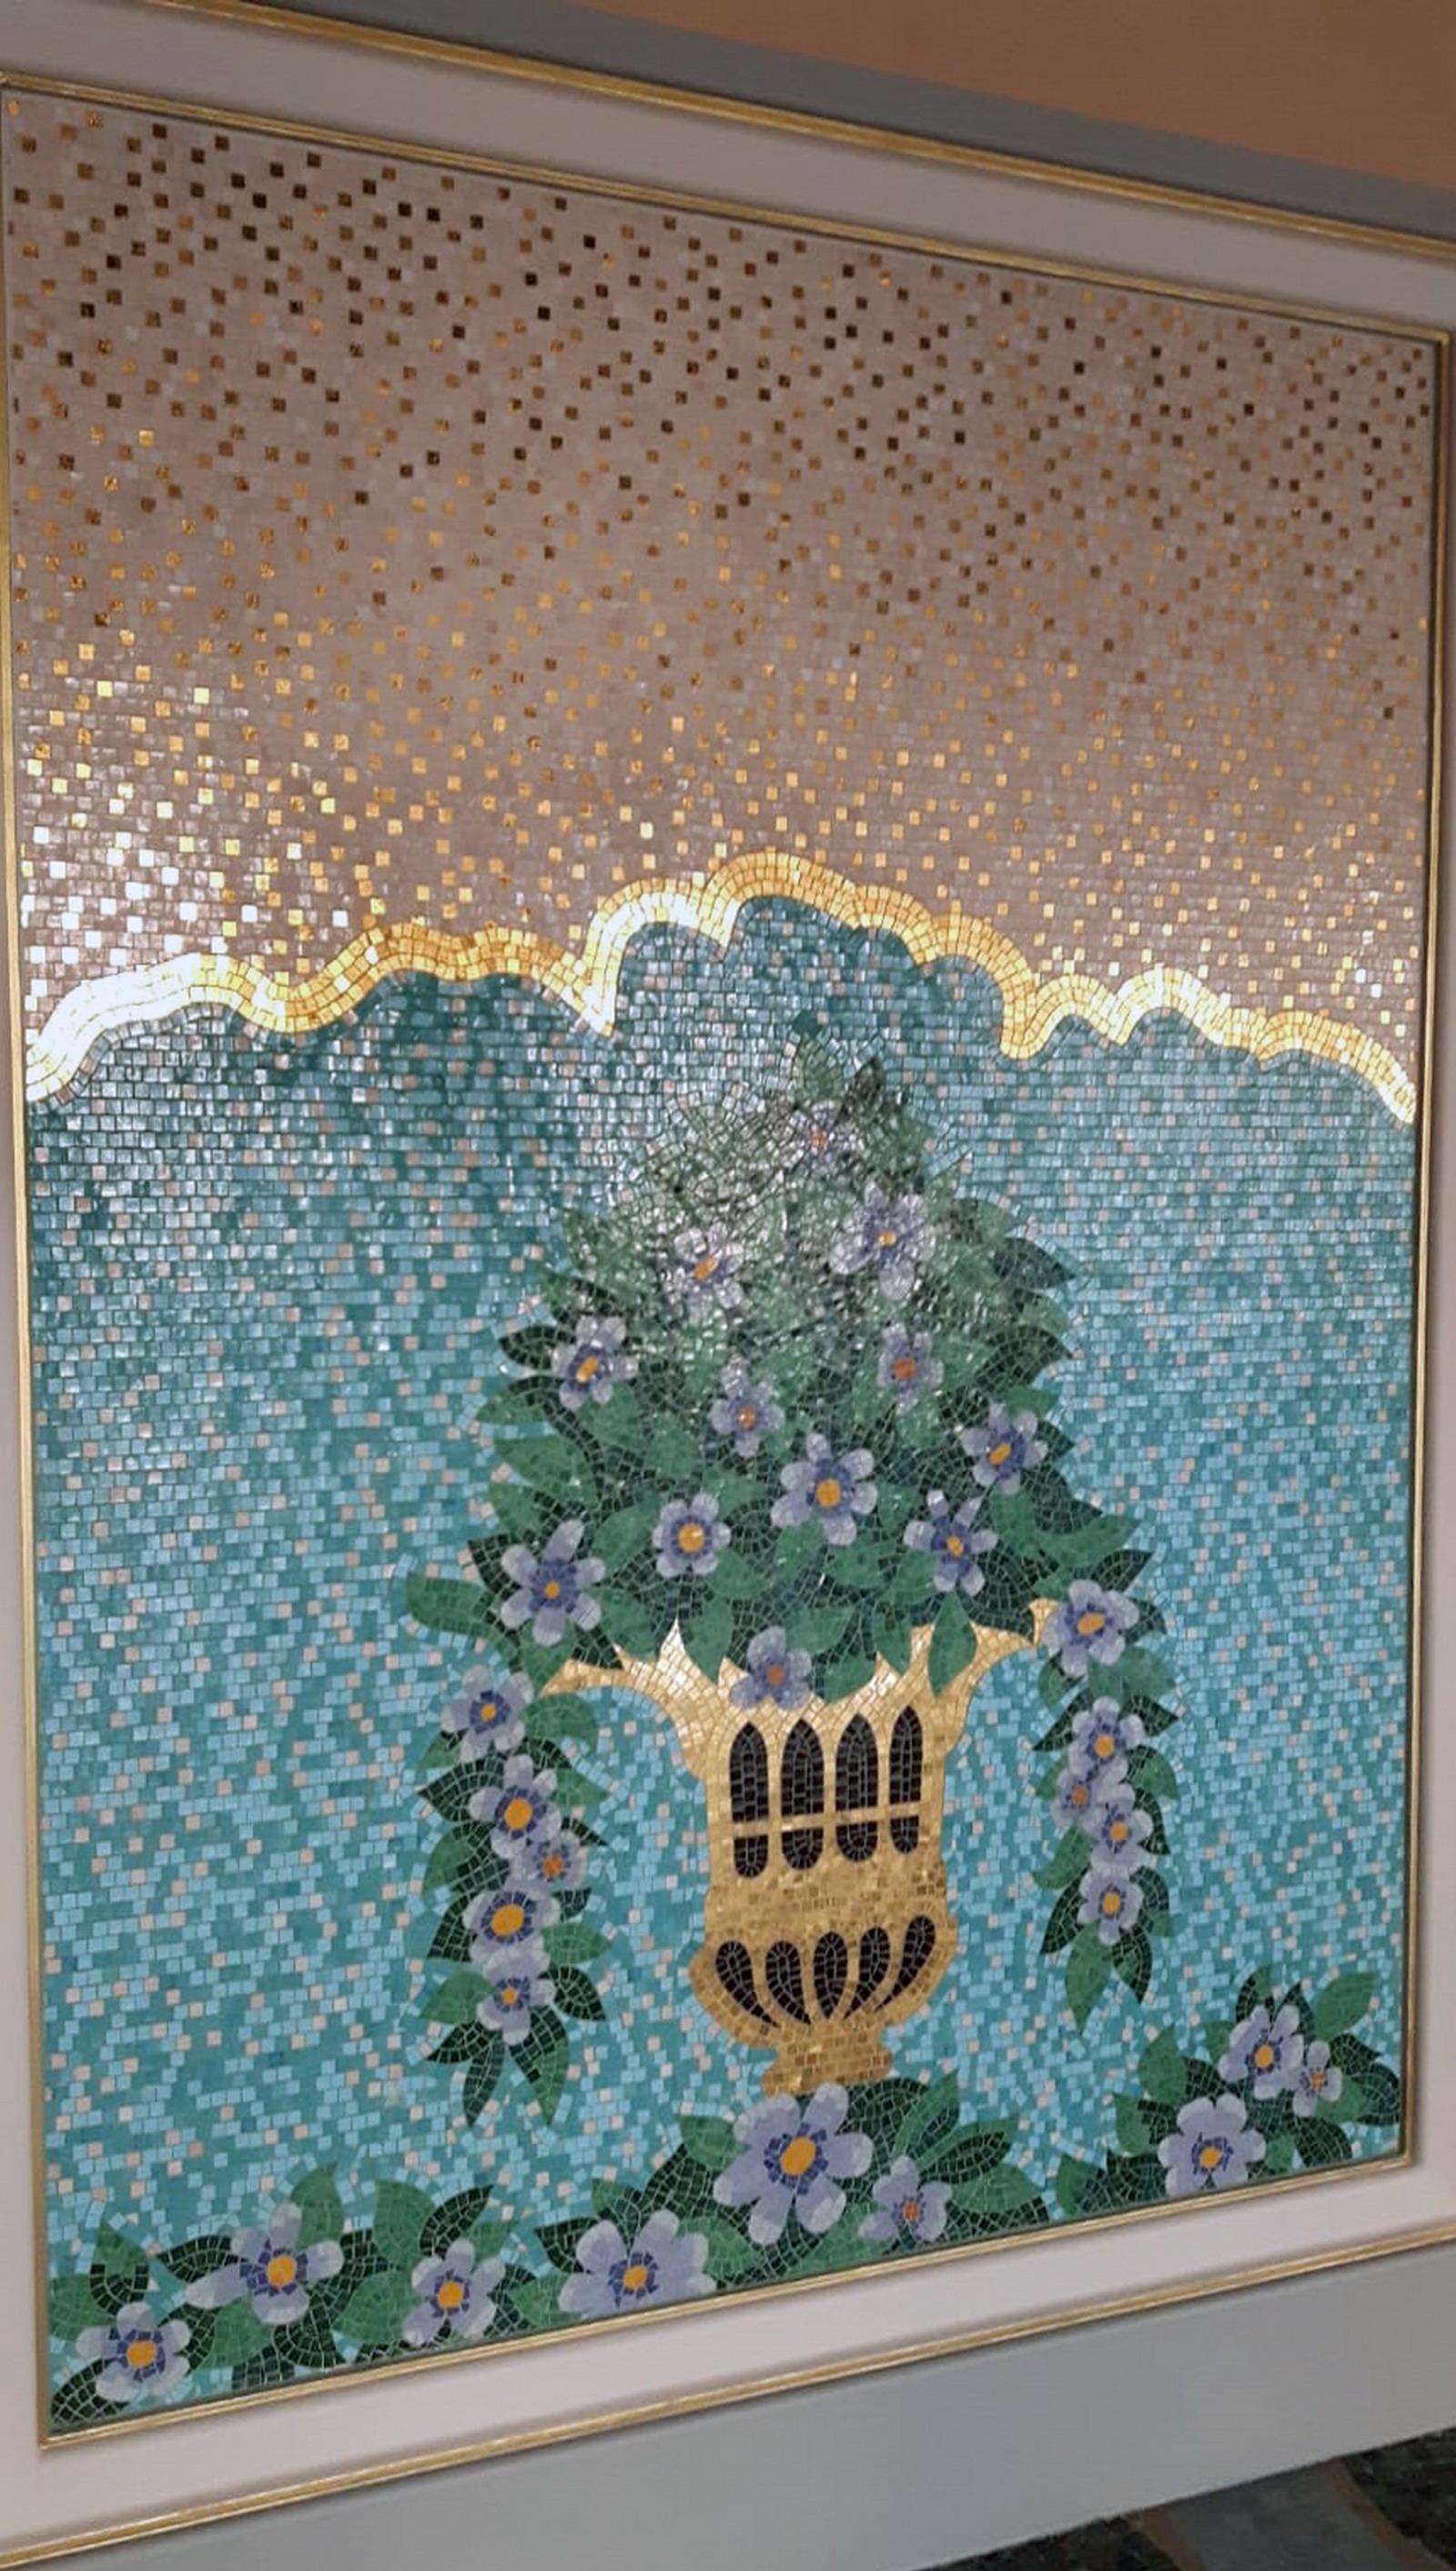 Dammam - Arabia Saudita - Mosaico in Marmo